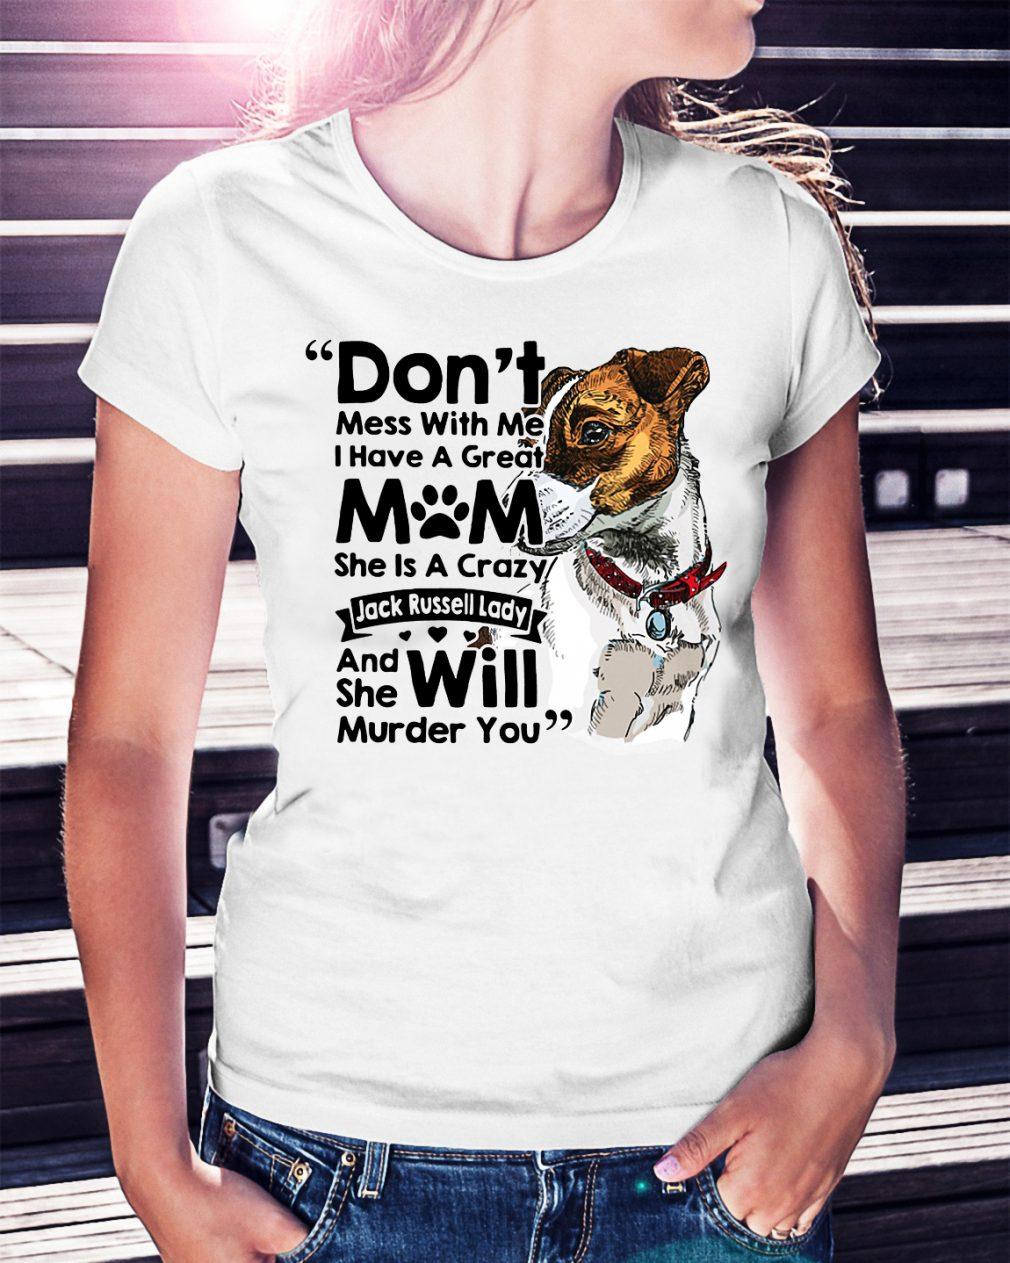 Don't mess with me I have a great mom she is a crazy Jack Russell shirt